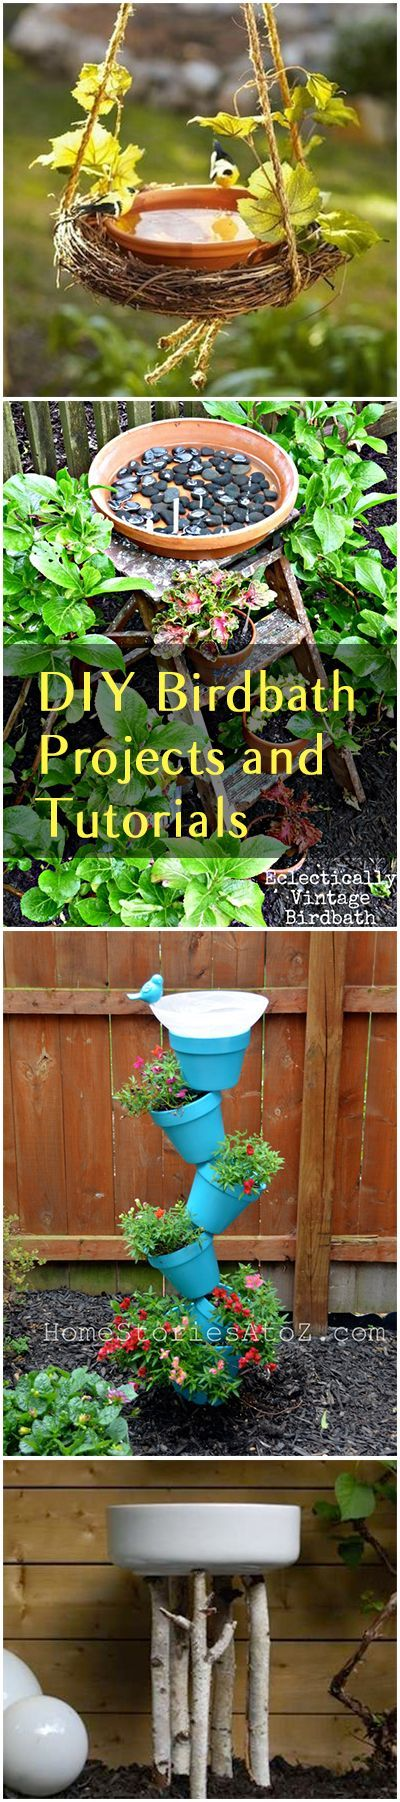 Diy birdbath projects and tutorials mangeoire jardins for Amenagement jardin 974